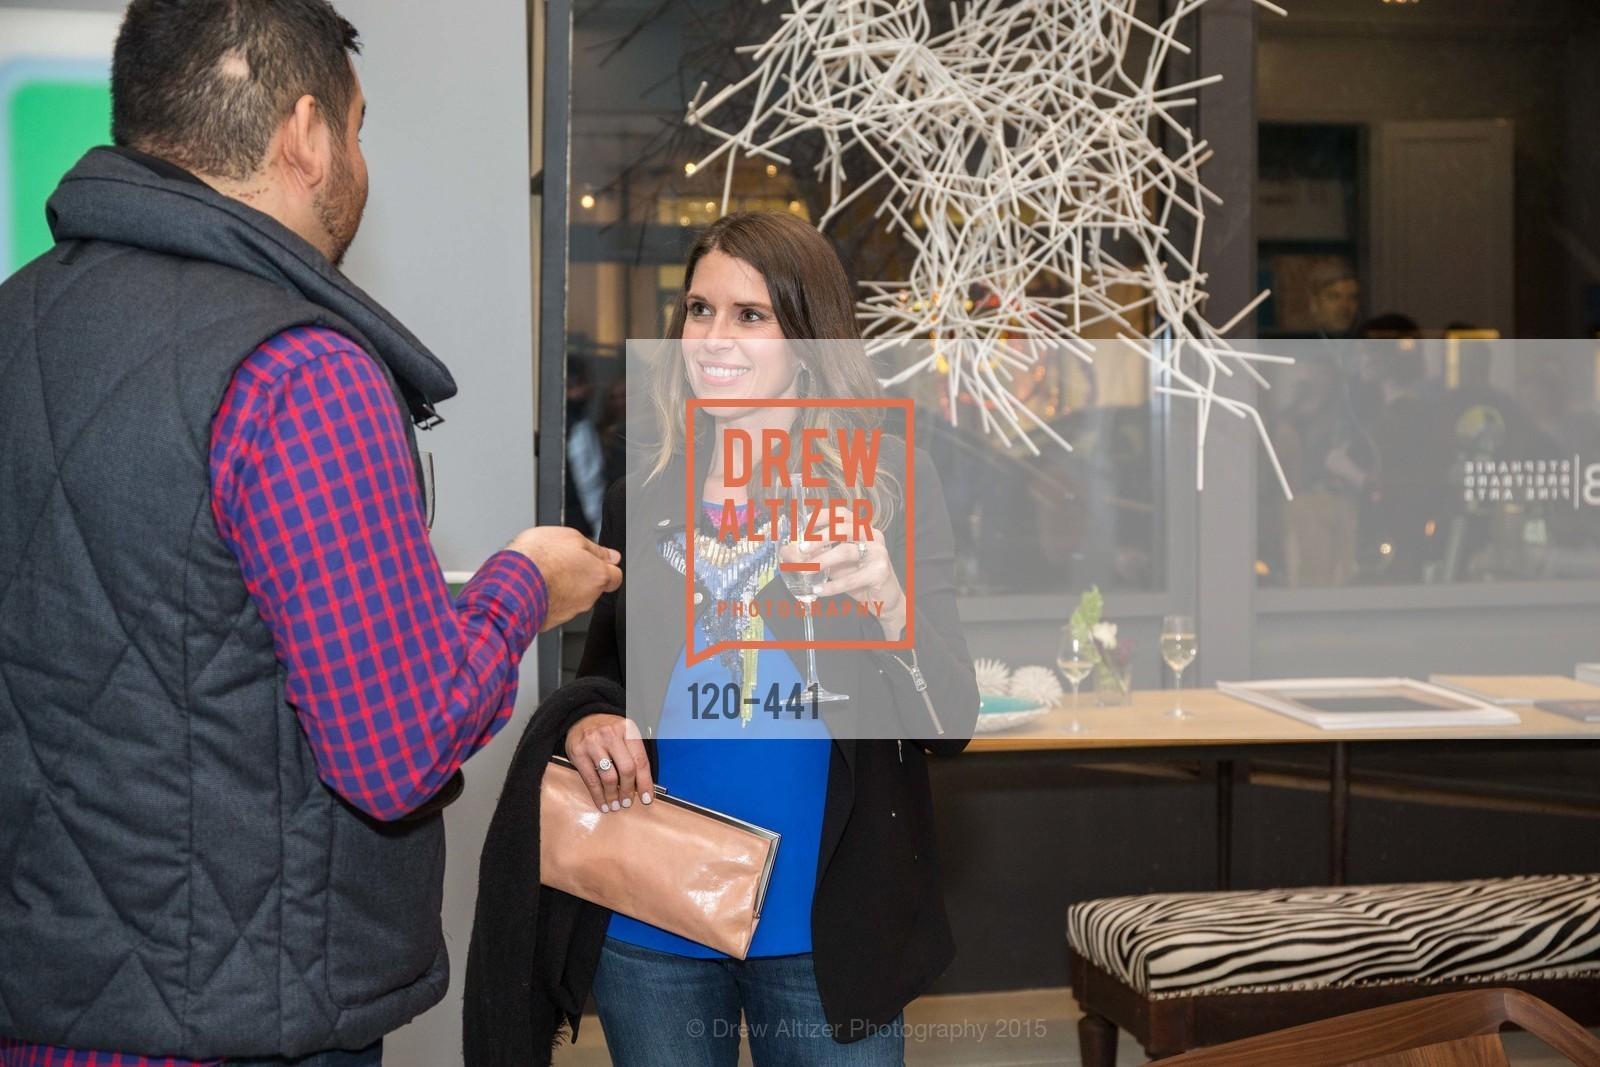 Extras, Stephanie Breitbard Fine Arts San Francisco Opening, November 5th, 2015, Photo,Drew Altizer, Drew Altizer Photography, full-service agency, private events, San Francisco photographer, photographer california